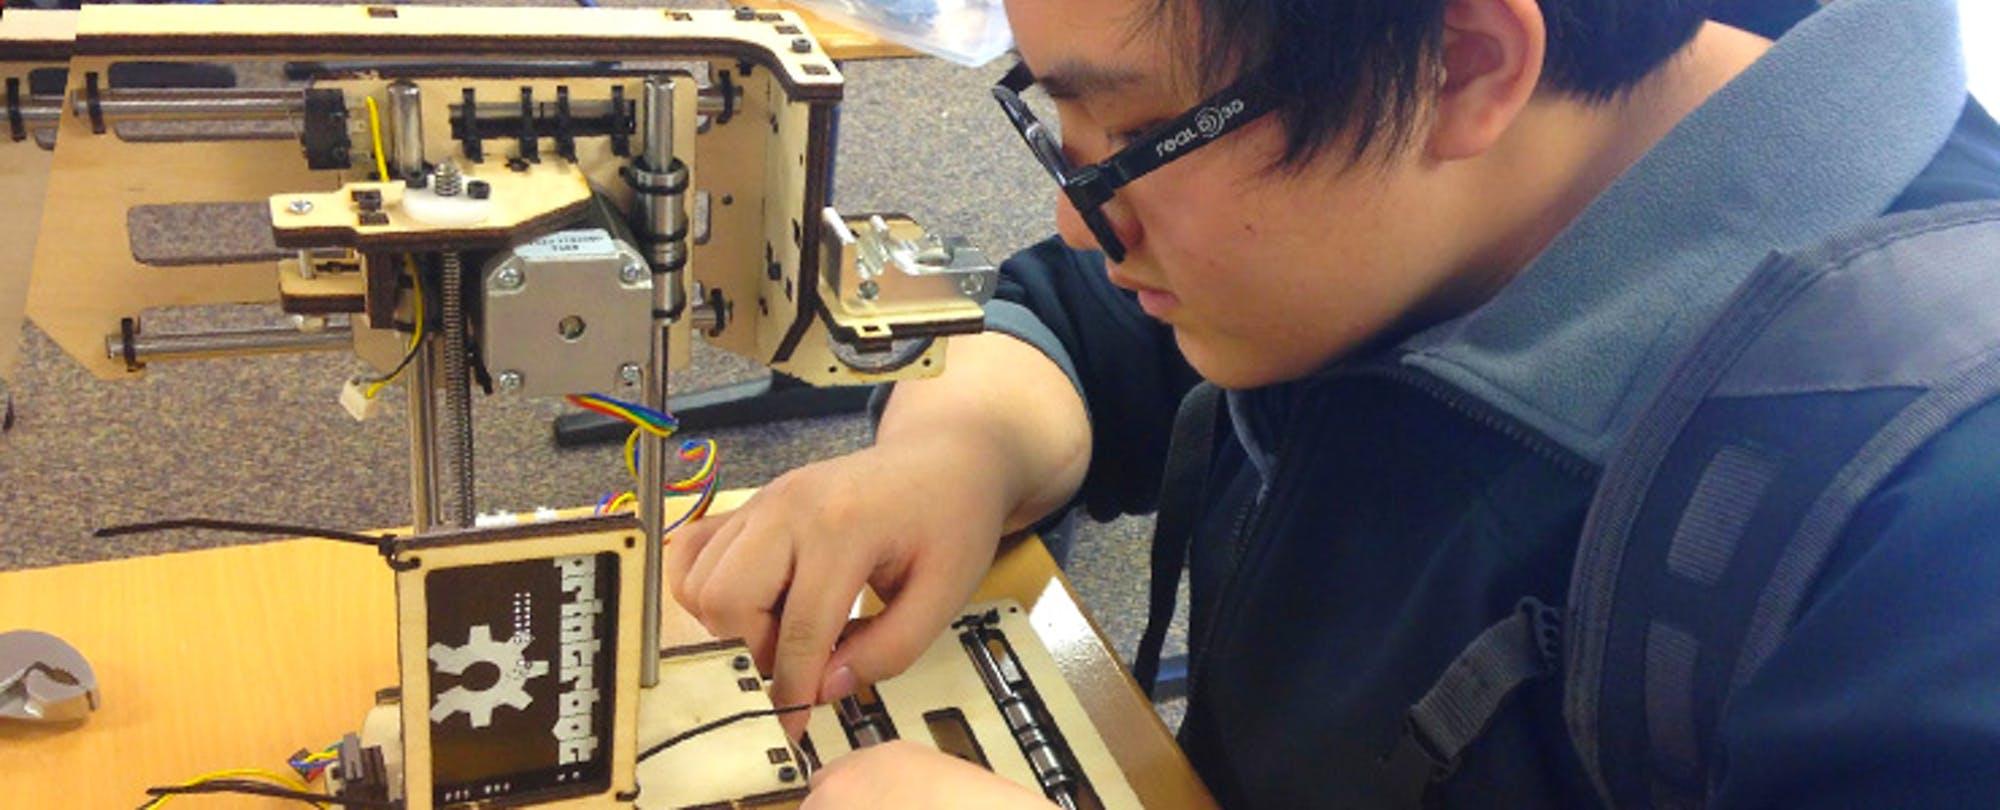 How I Built a 3D Printer On My Lunch Break